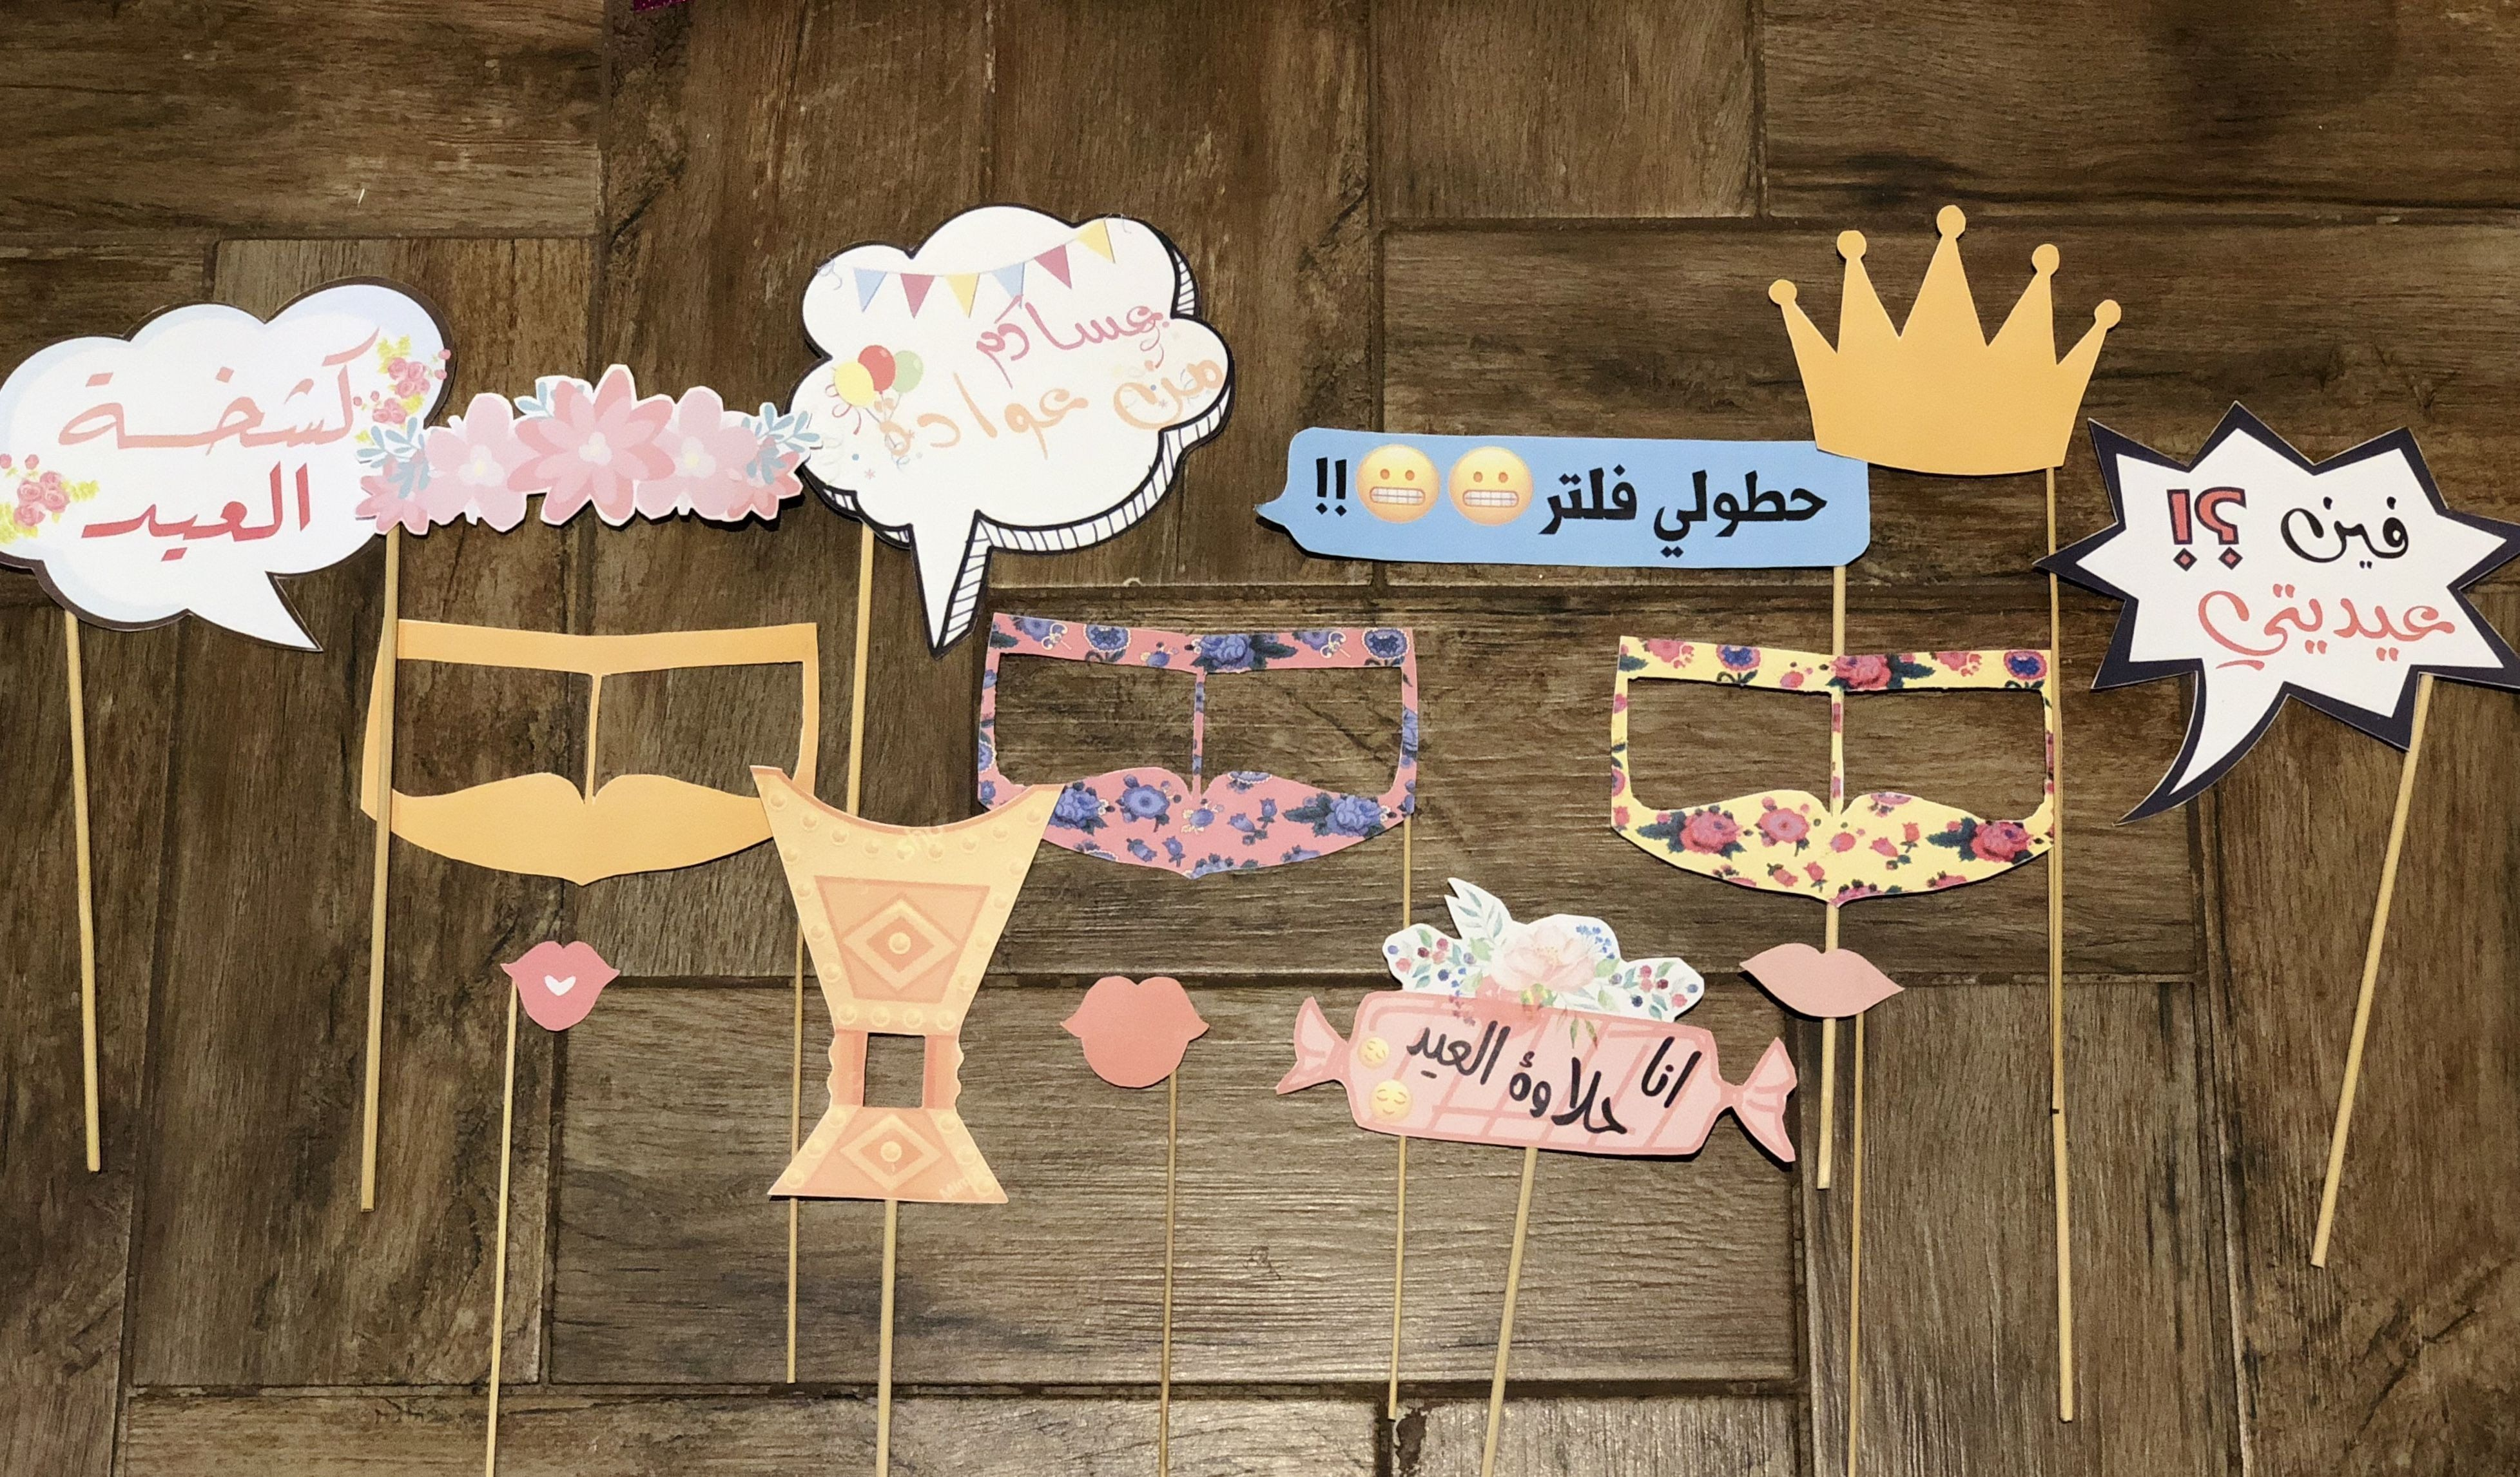 Eid Decoration Ideas Elegant Eid Props For The Photo Boothdÿ Just Click To The Superfishalsf Designs Ramadan Crafts Eid Decoration Eid Crafts